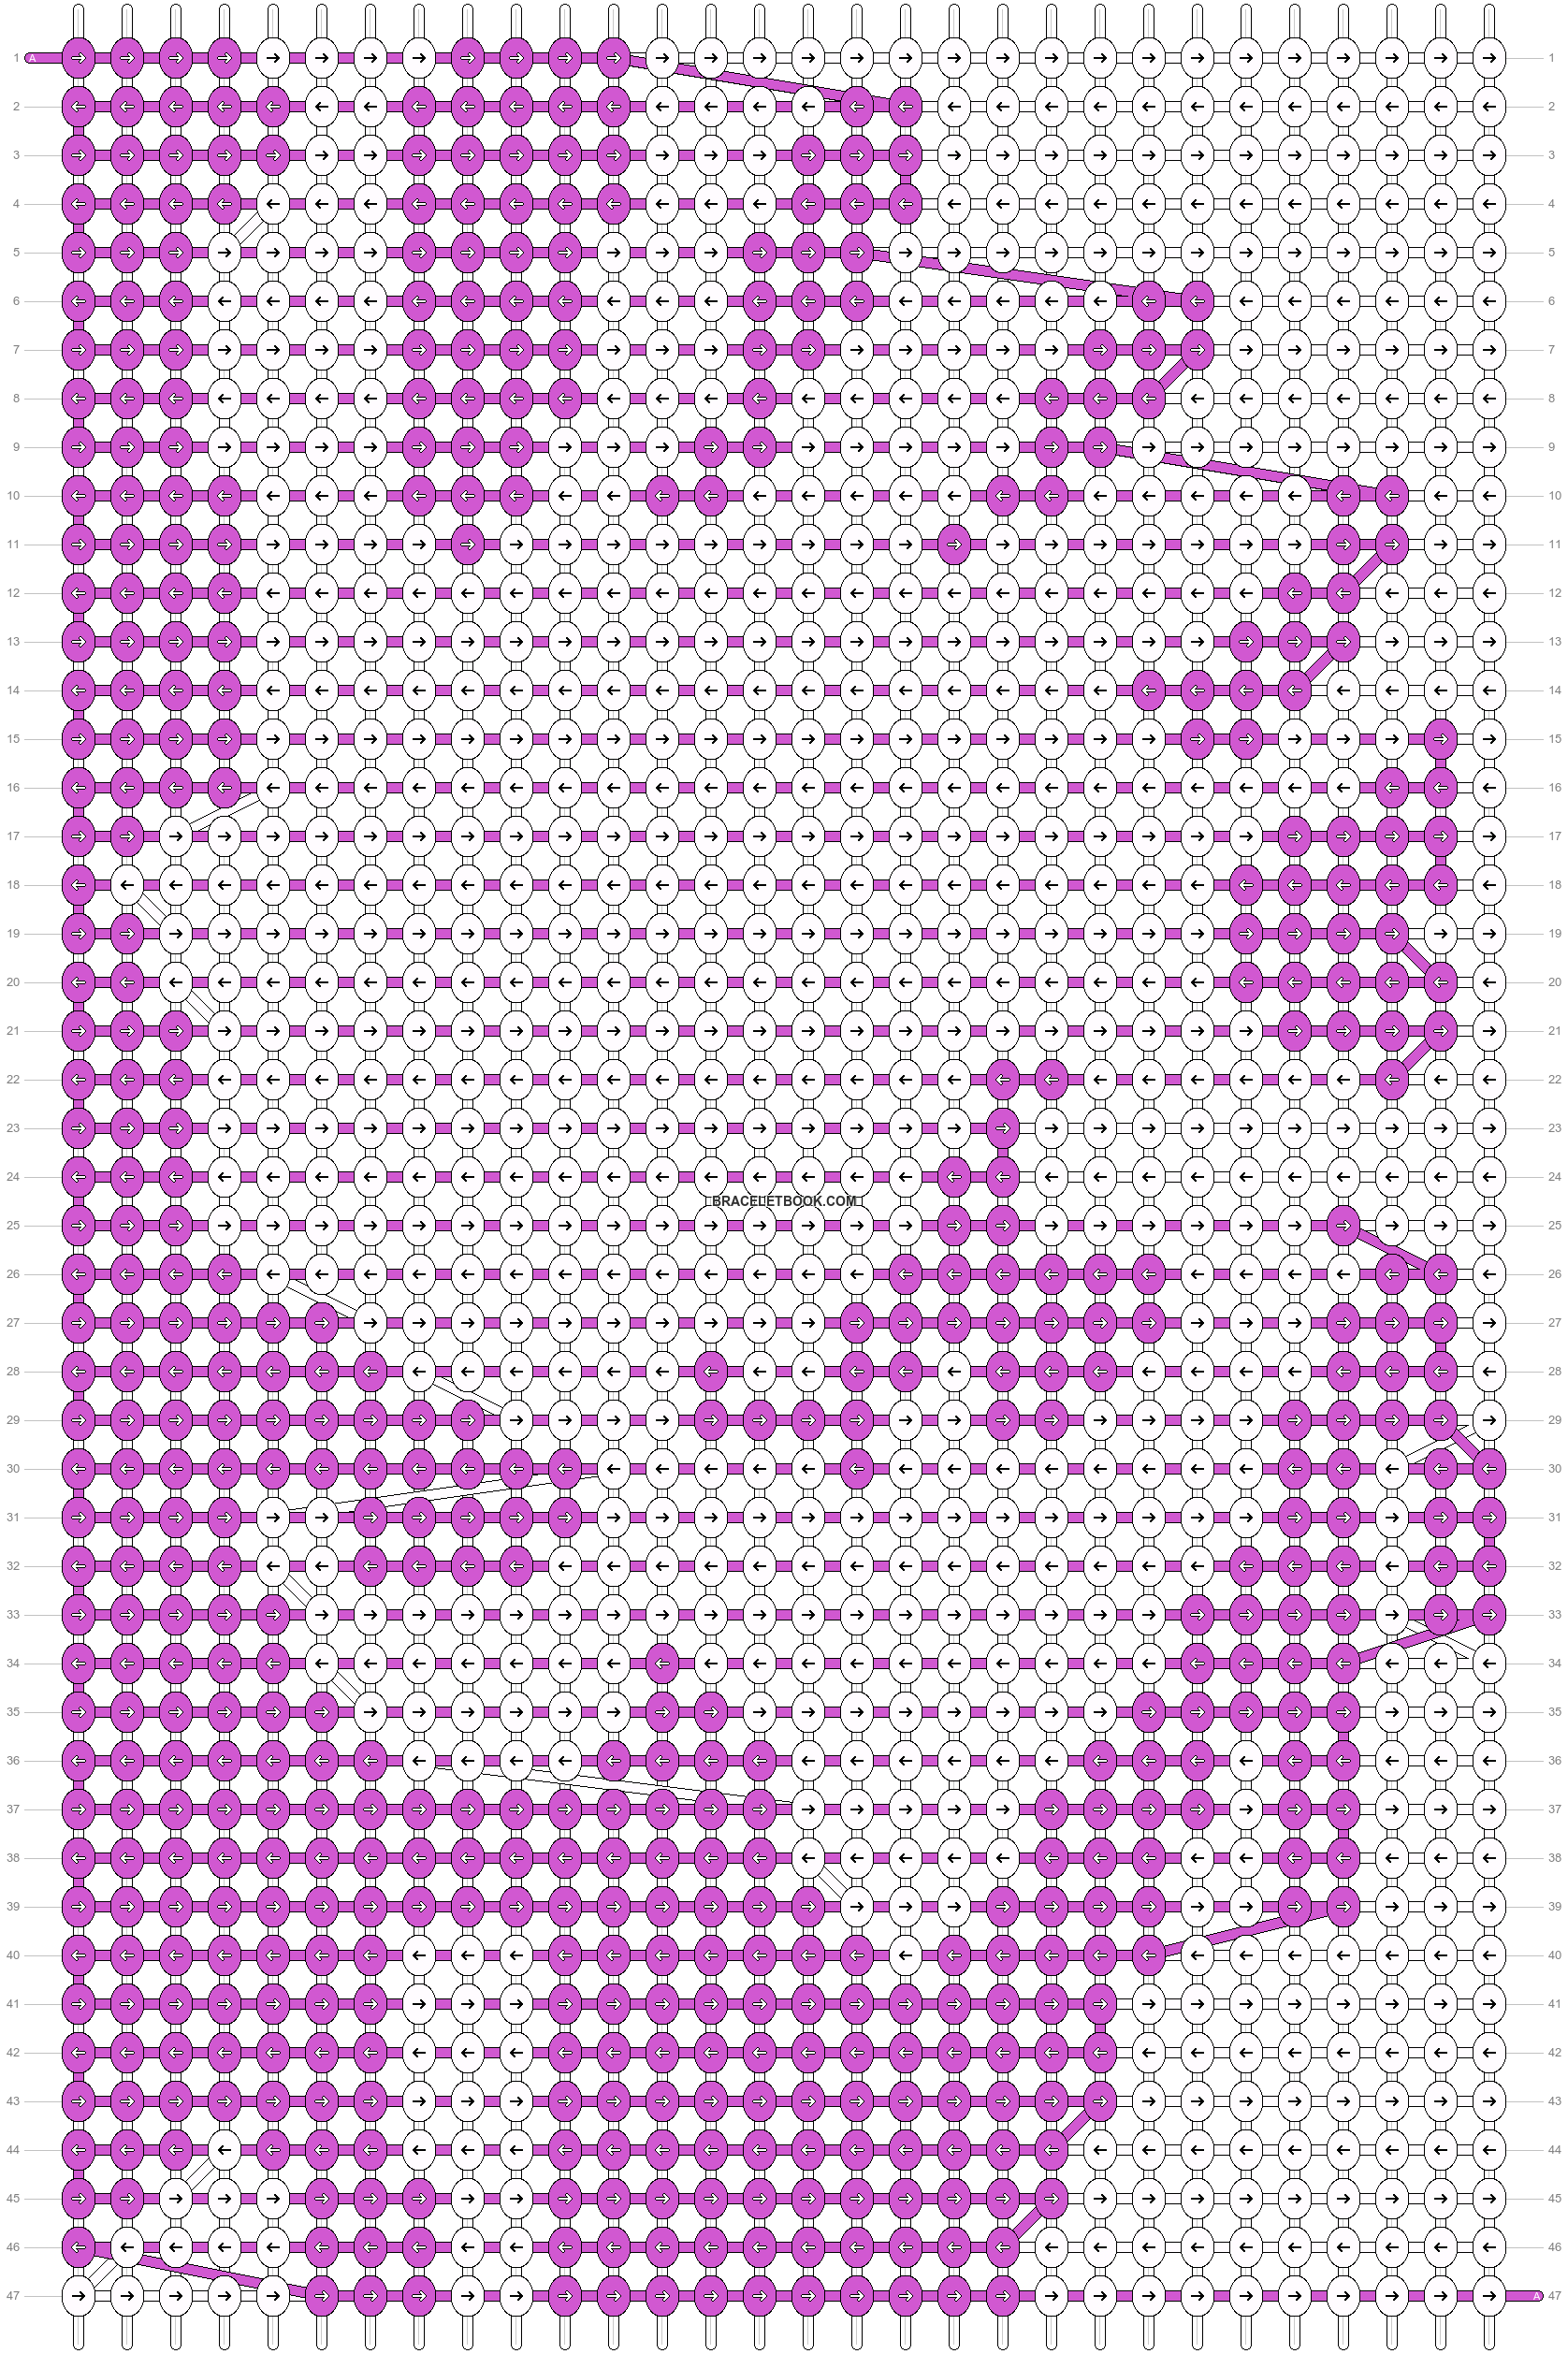 Alpha pattern #11662 pattern